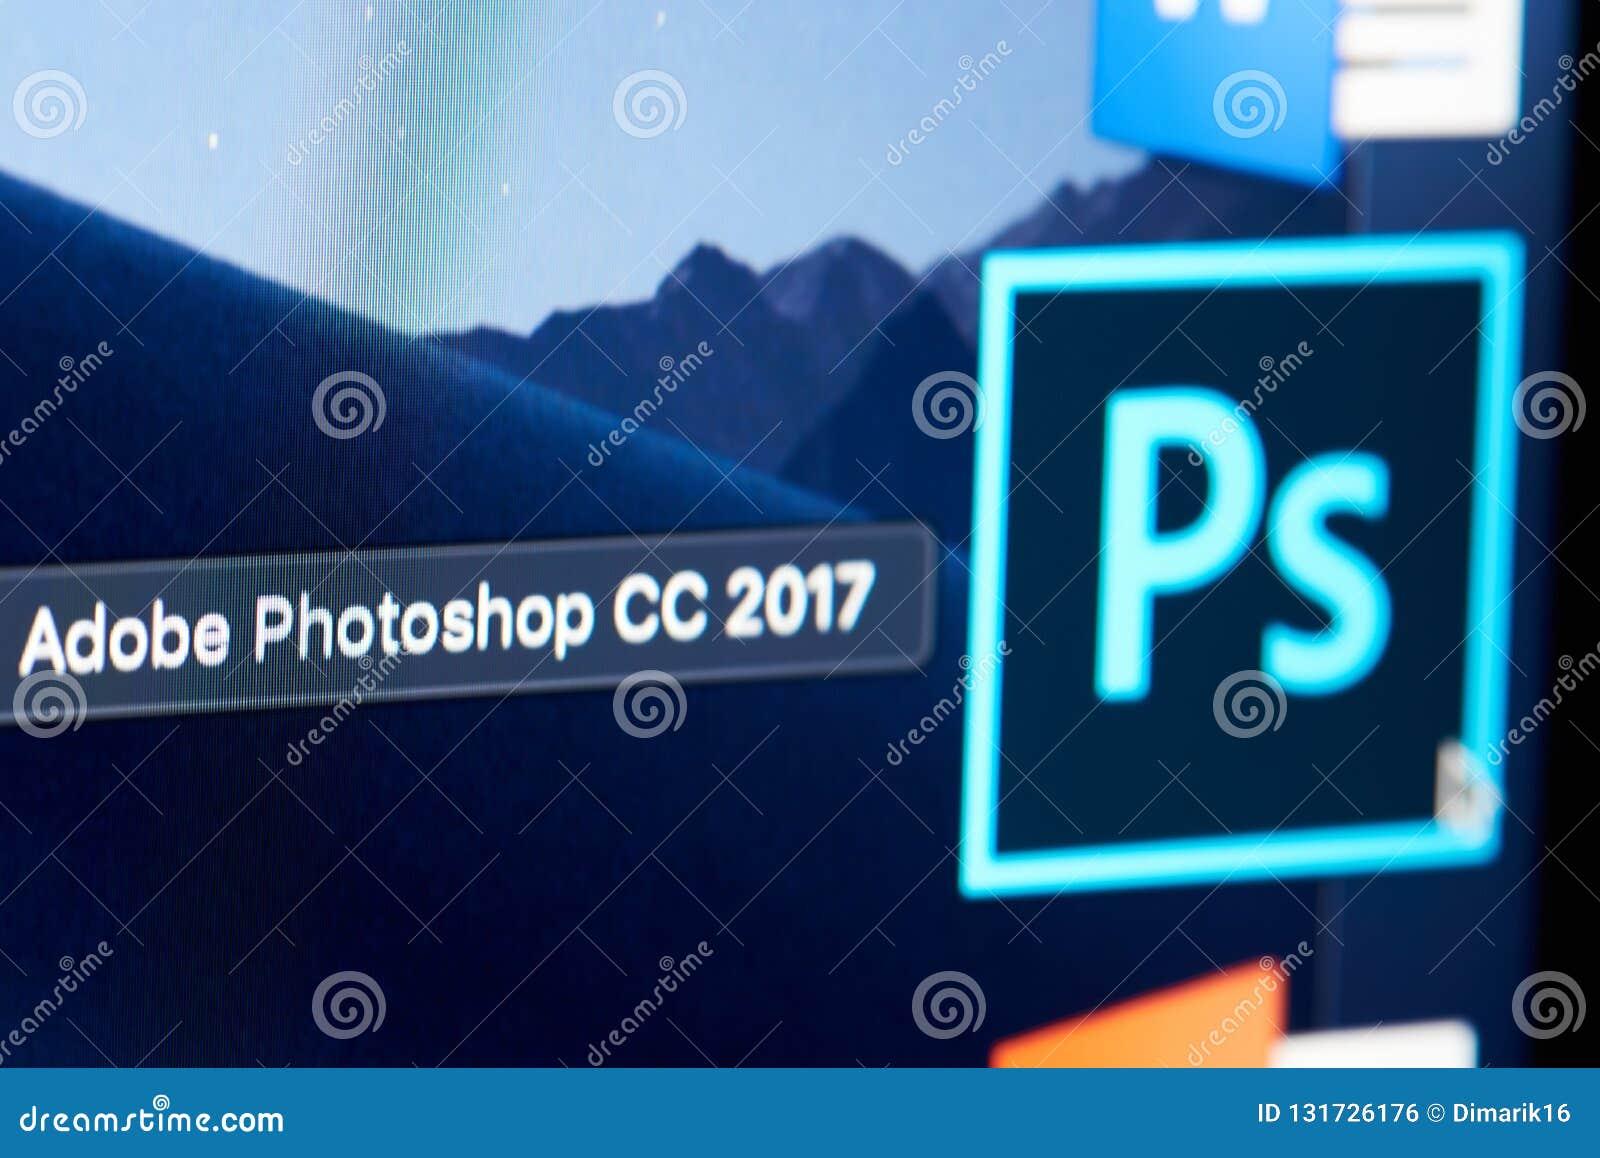 Adobe Photoshop CC Icon On Screen Editorial Photo - Image of